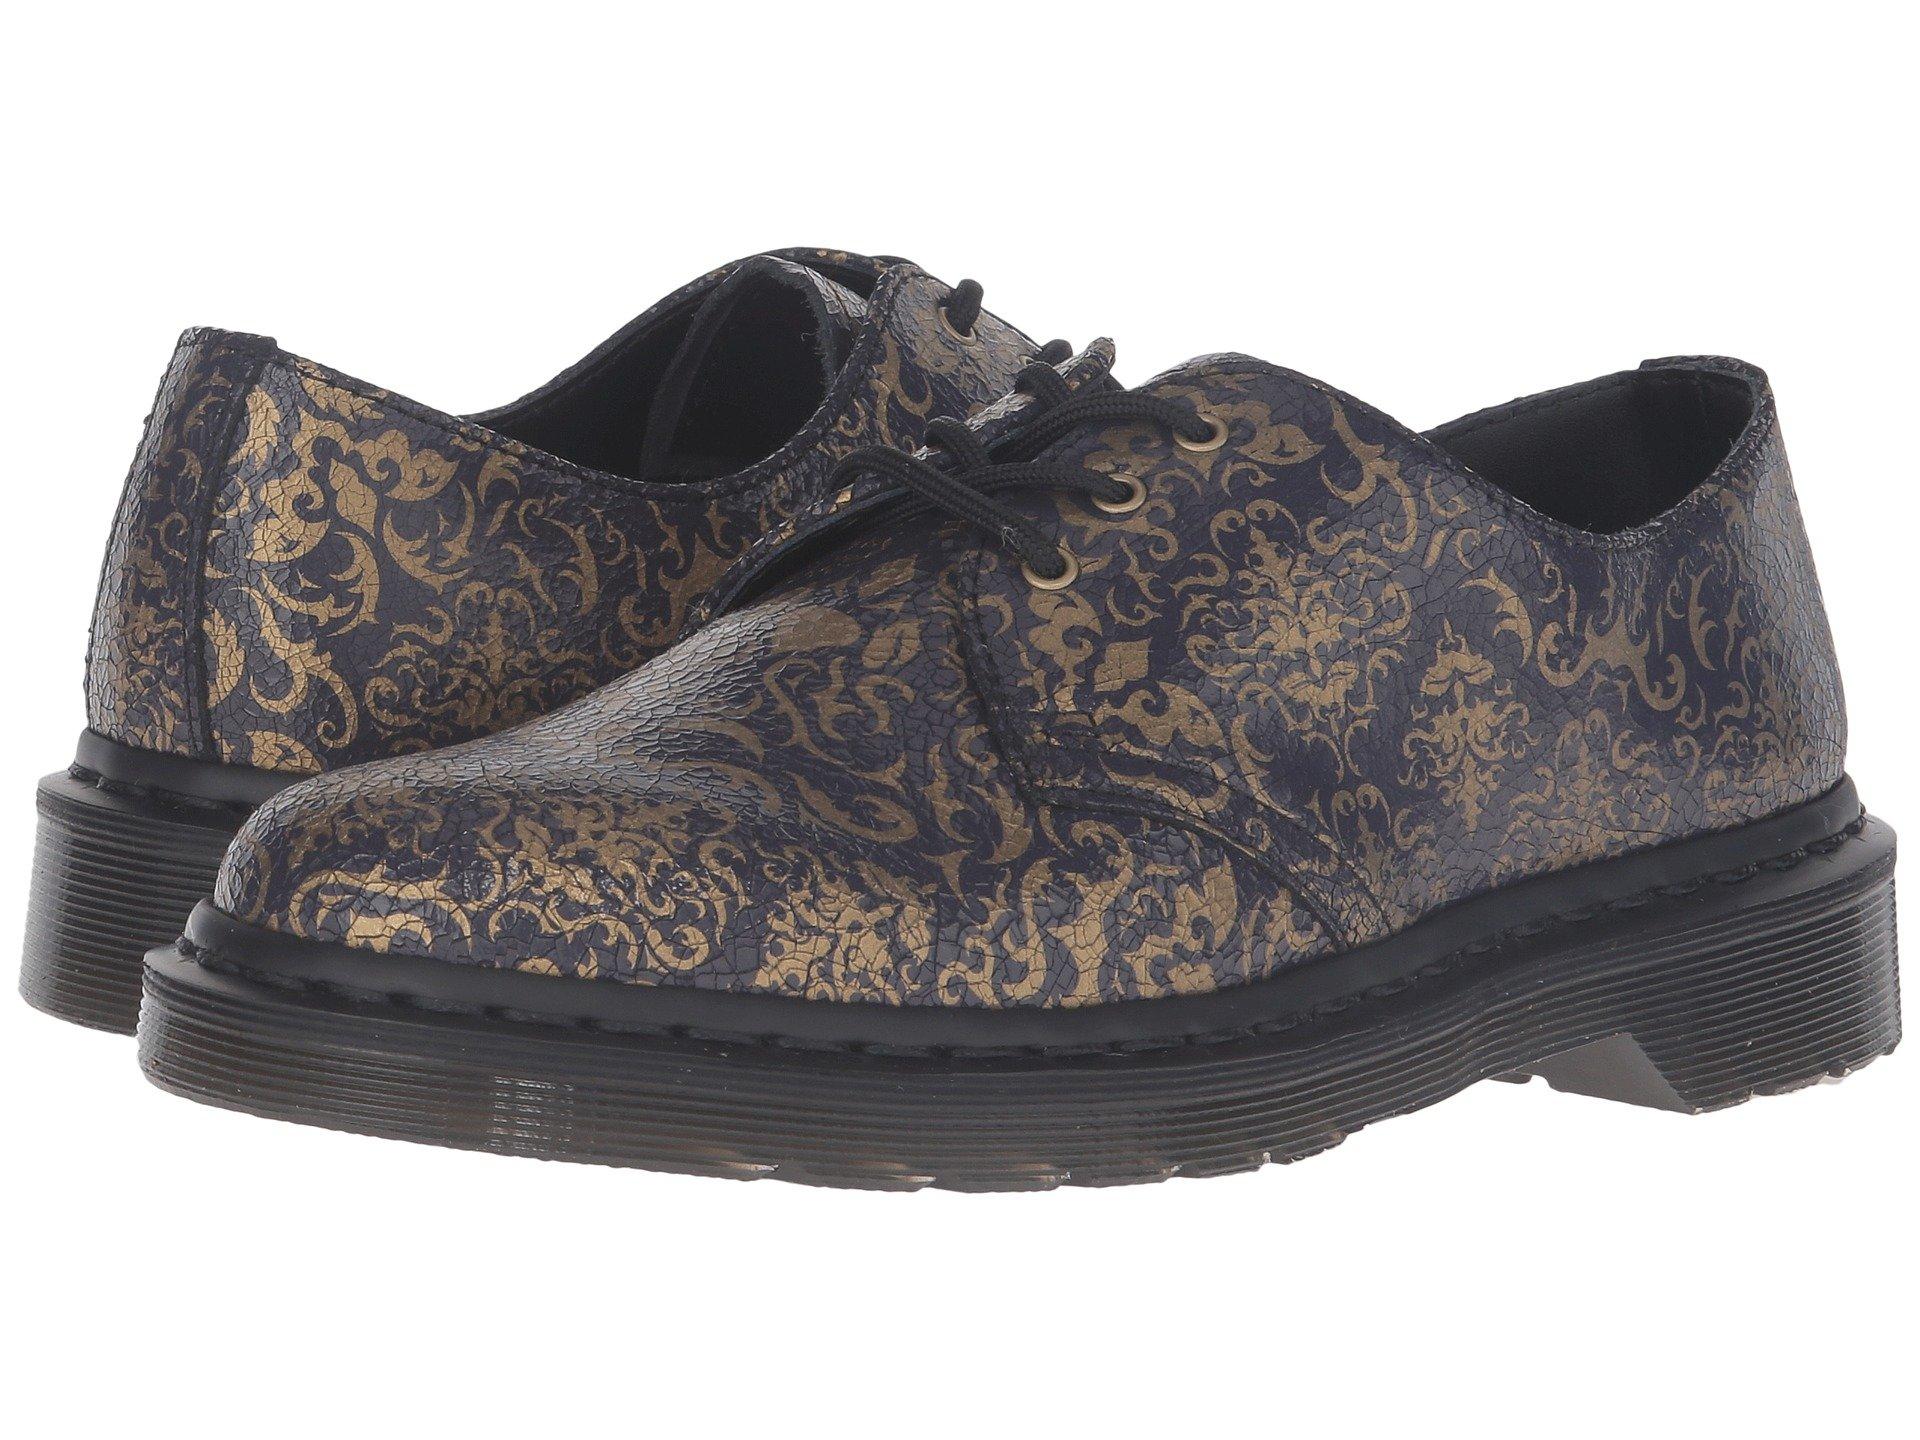 Zapato Casual para Mujer Dr. Martens 1461 BQ 3-Eye Shoe  + Dr. Martens en VeoyCompro.net